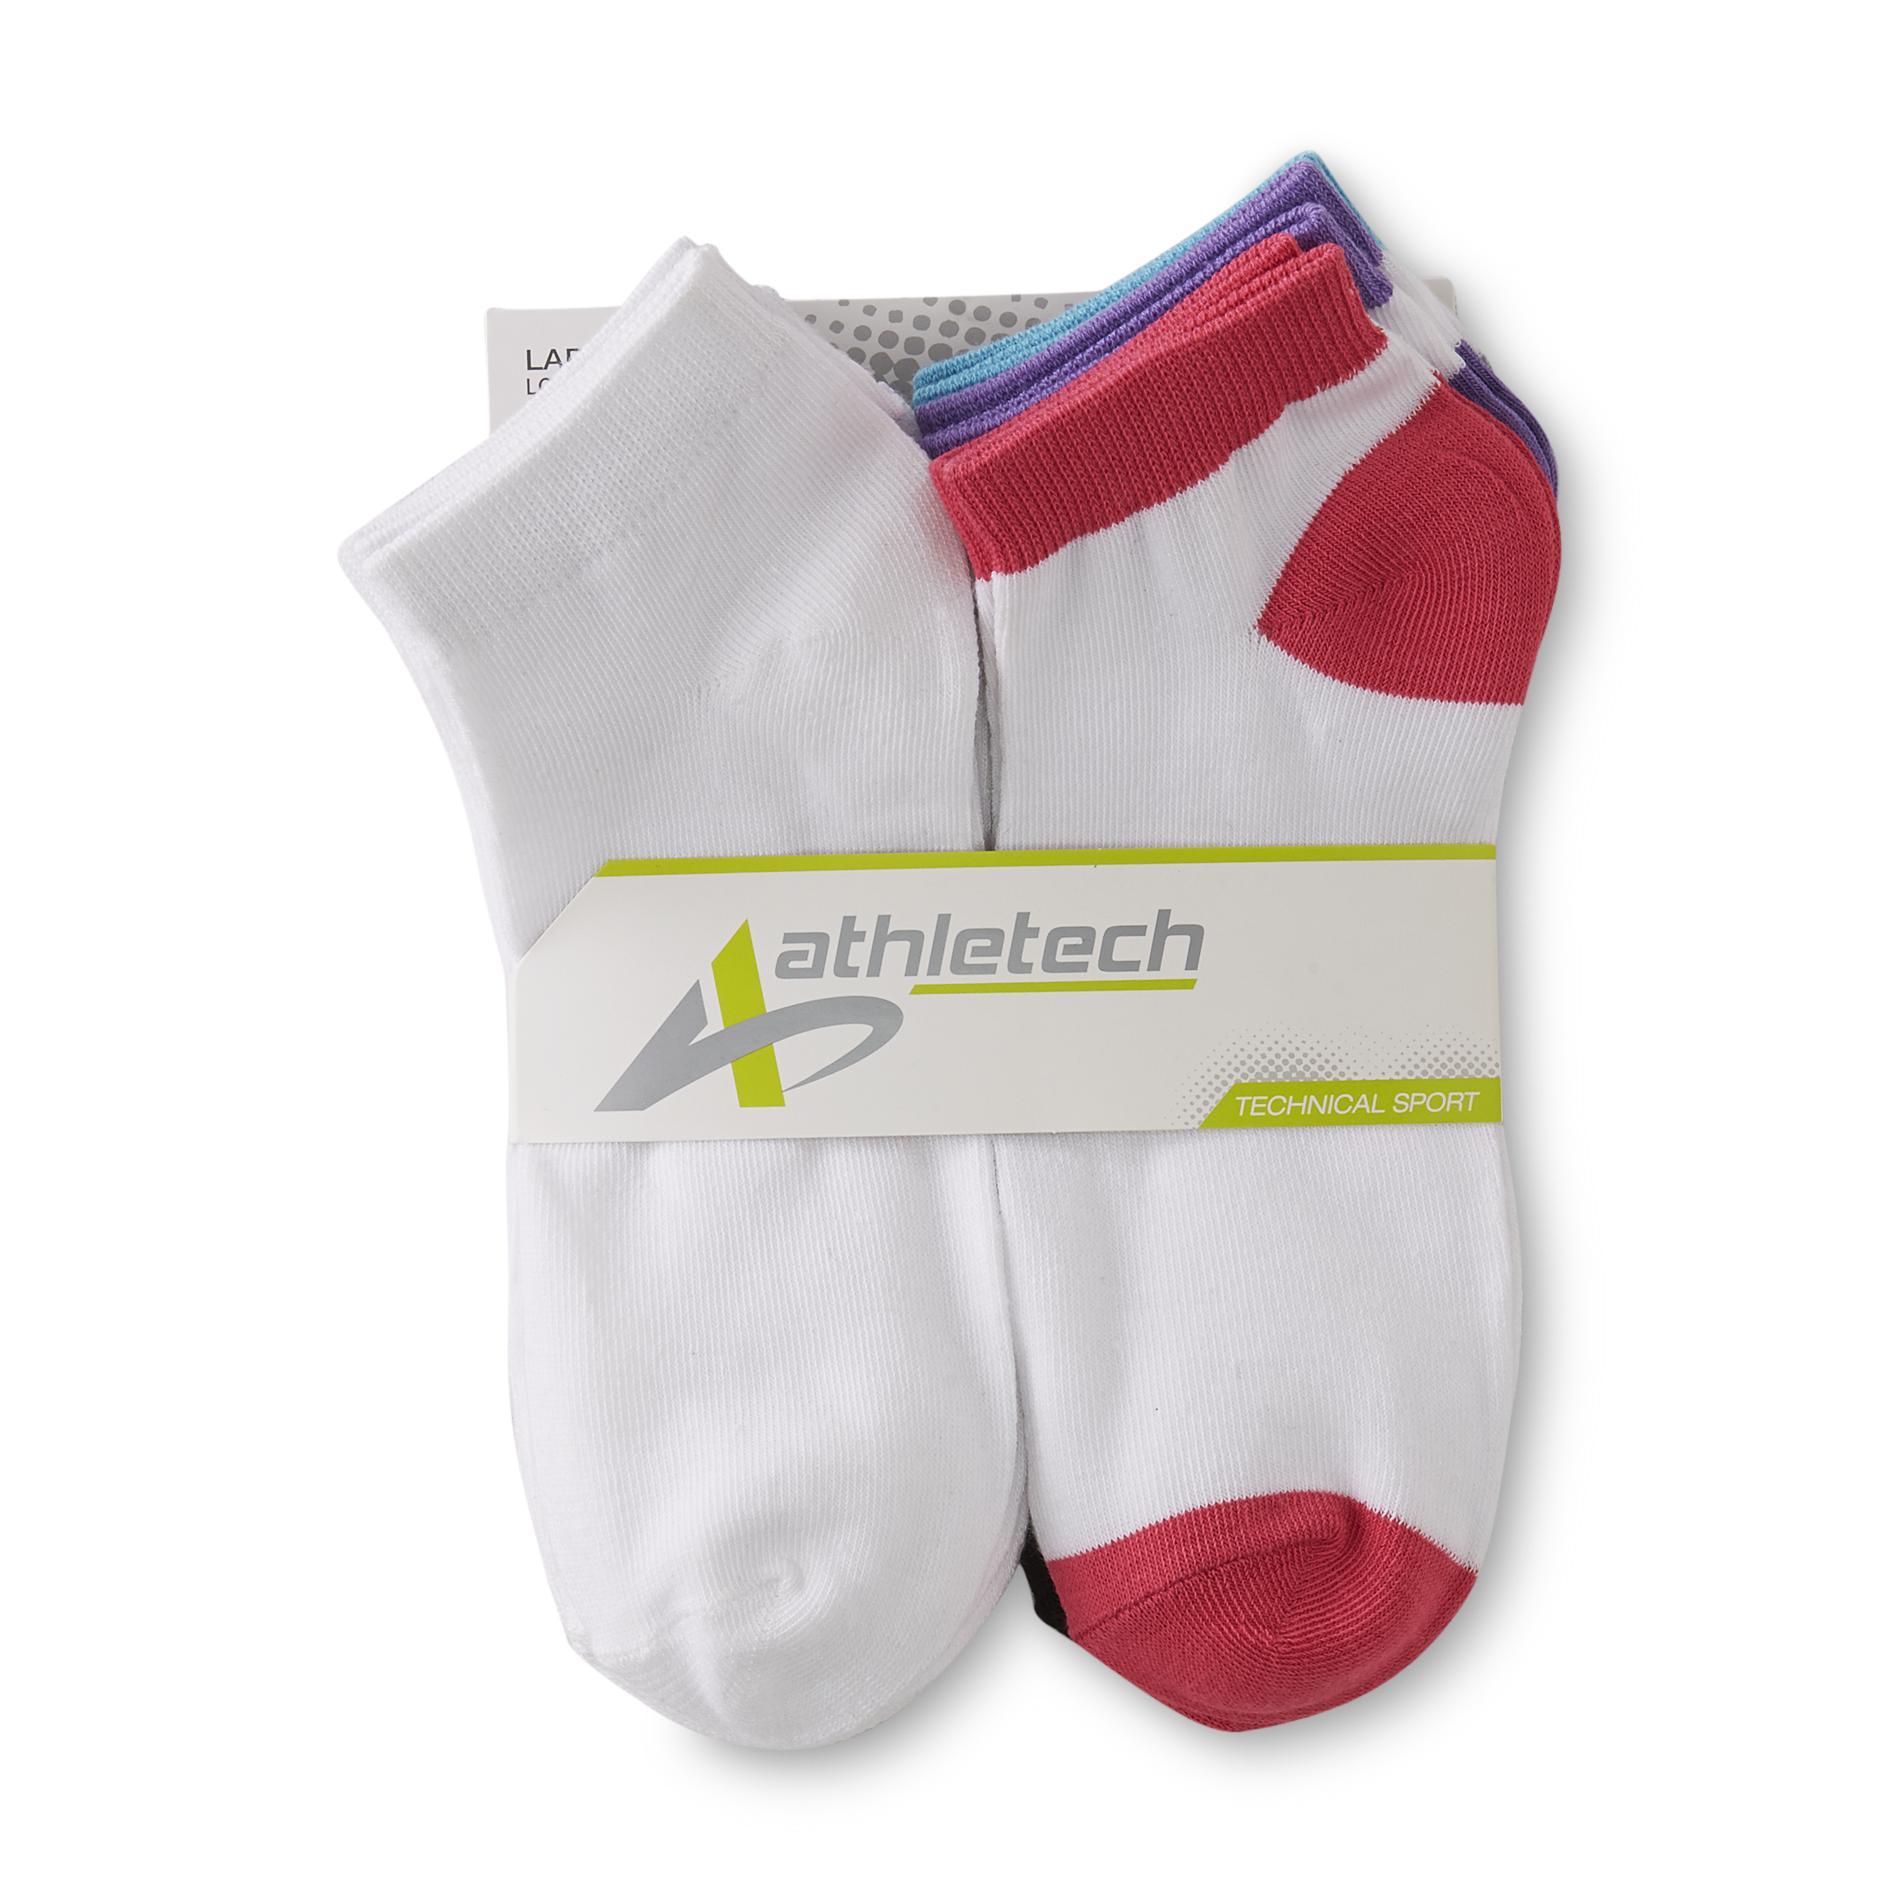 Women's 10-Pairs Technical Sport Low-Cut Liner Socks - Colorblock